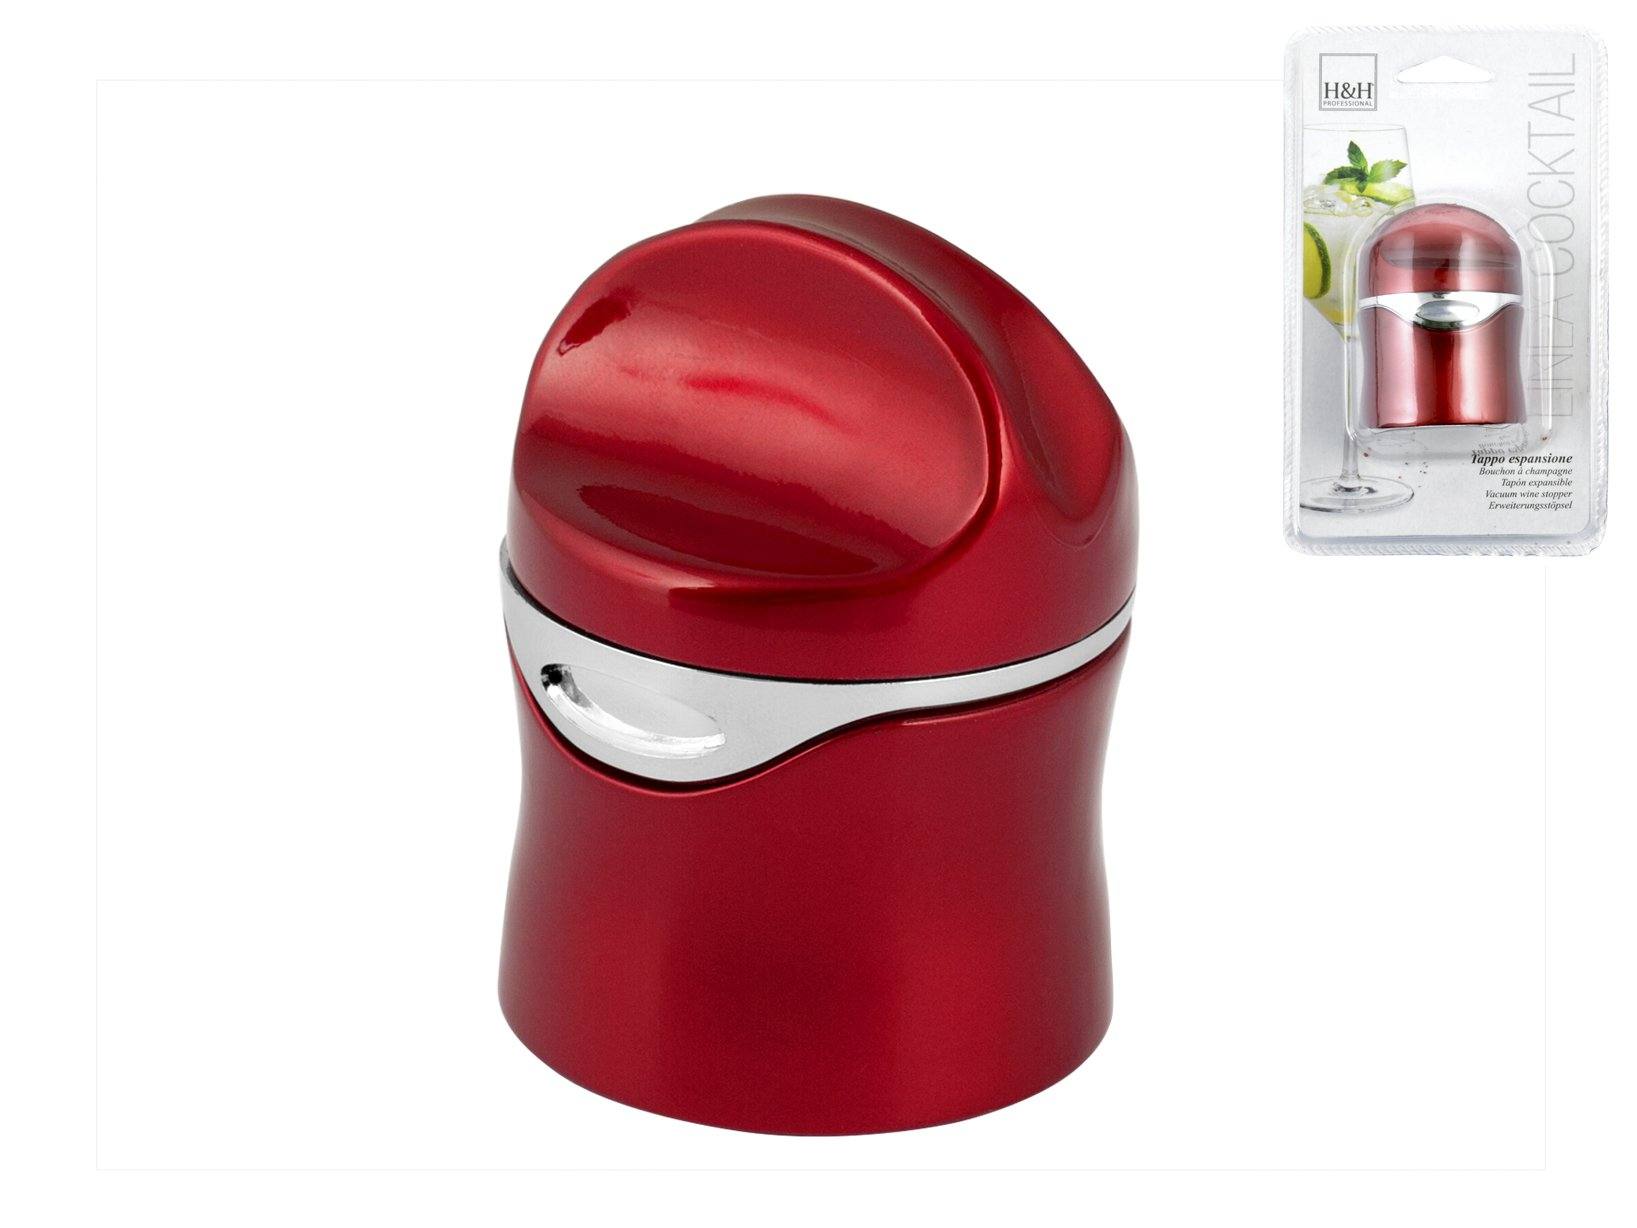 H&H Set 6 Tappi a espansione plastica rossa Bottiglie Arredo tavola